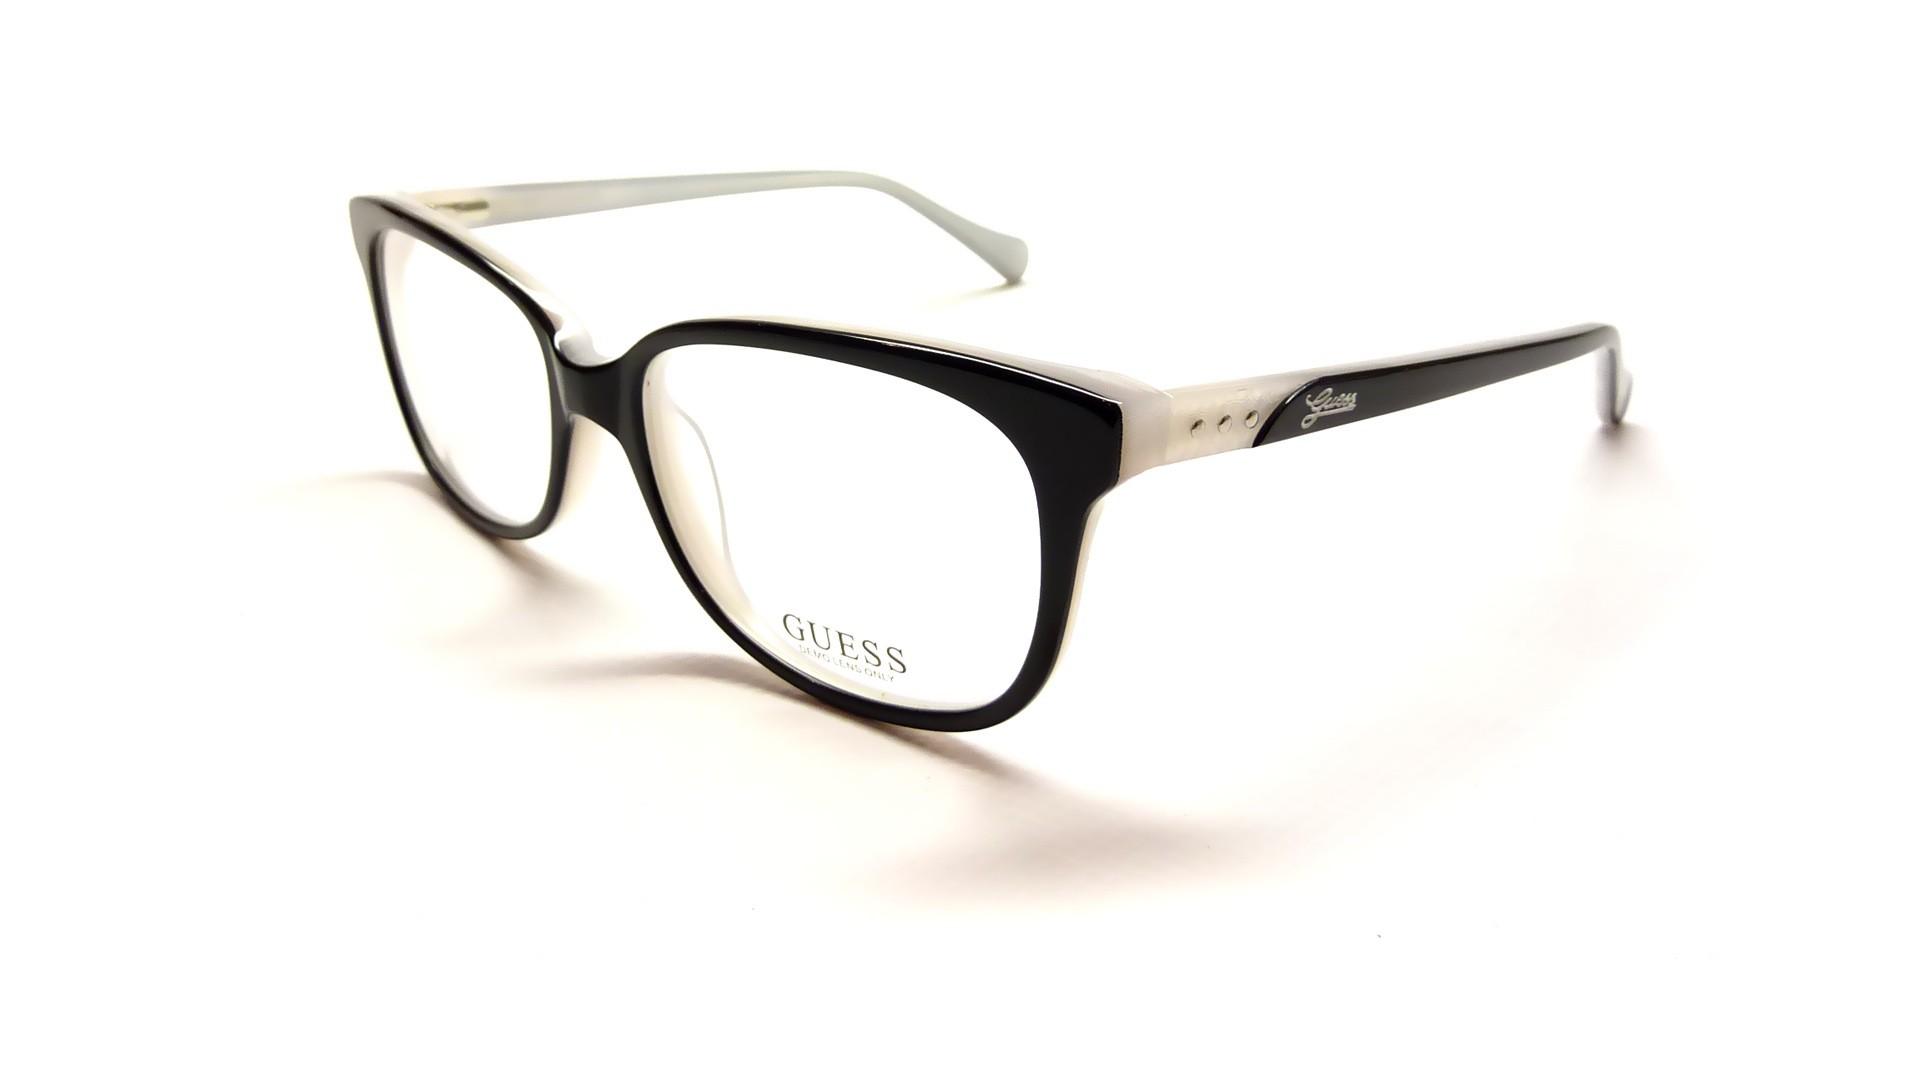 Guess Eyeglass Frames 2293 : Guess GU2293 BKWHT 52-16 Black Visiofactory